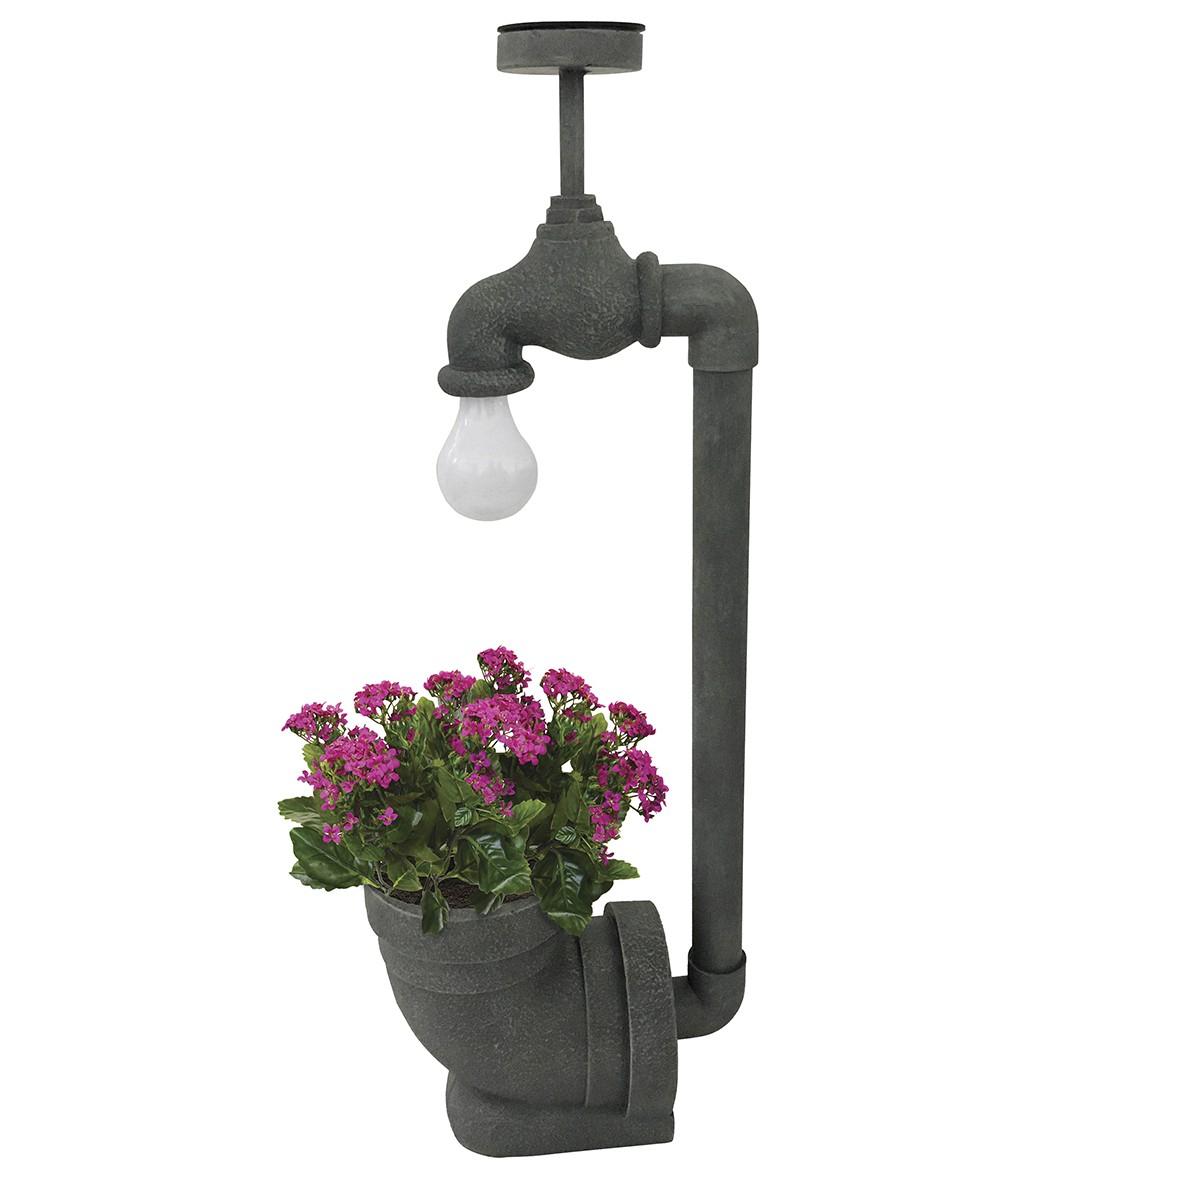 Mansion Solar Powered Tap Light & Flower Pot Holder £14.93 @ Robert Dyas (Free C&C)